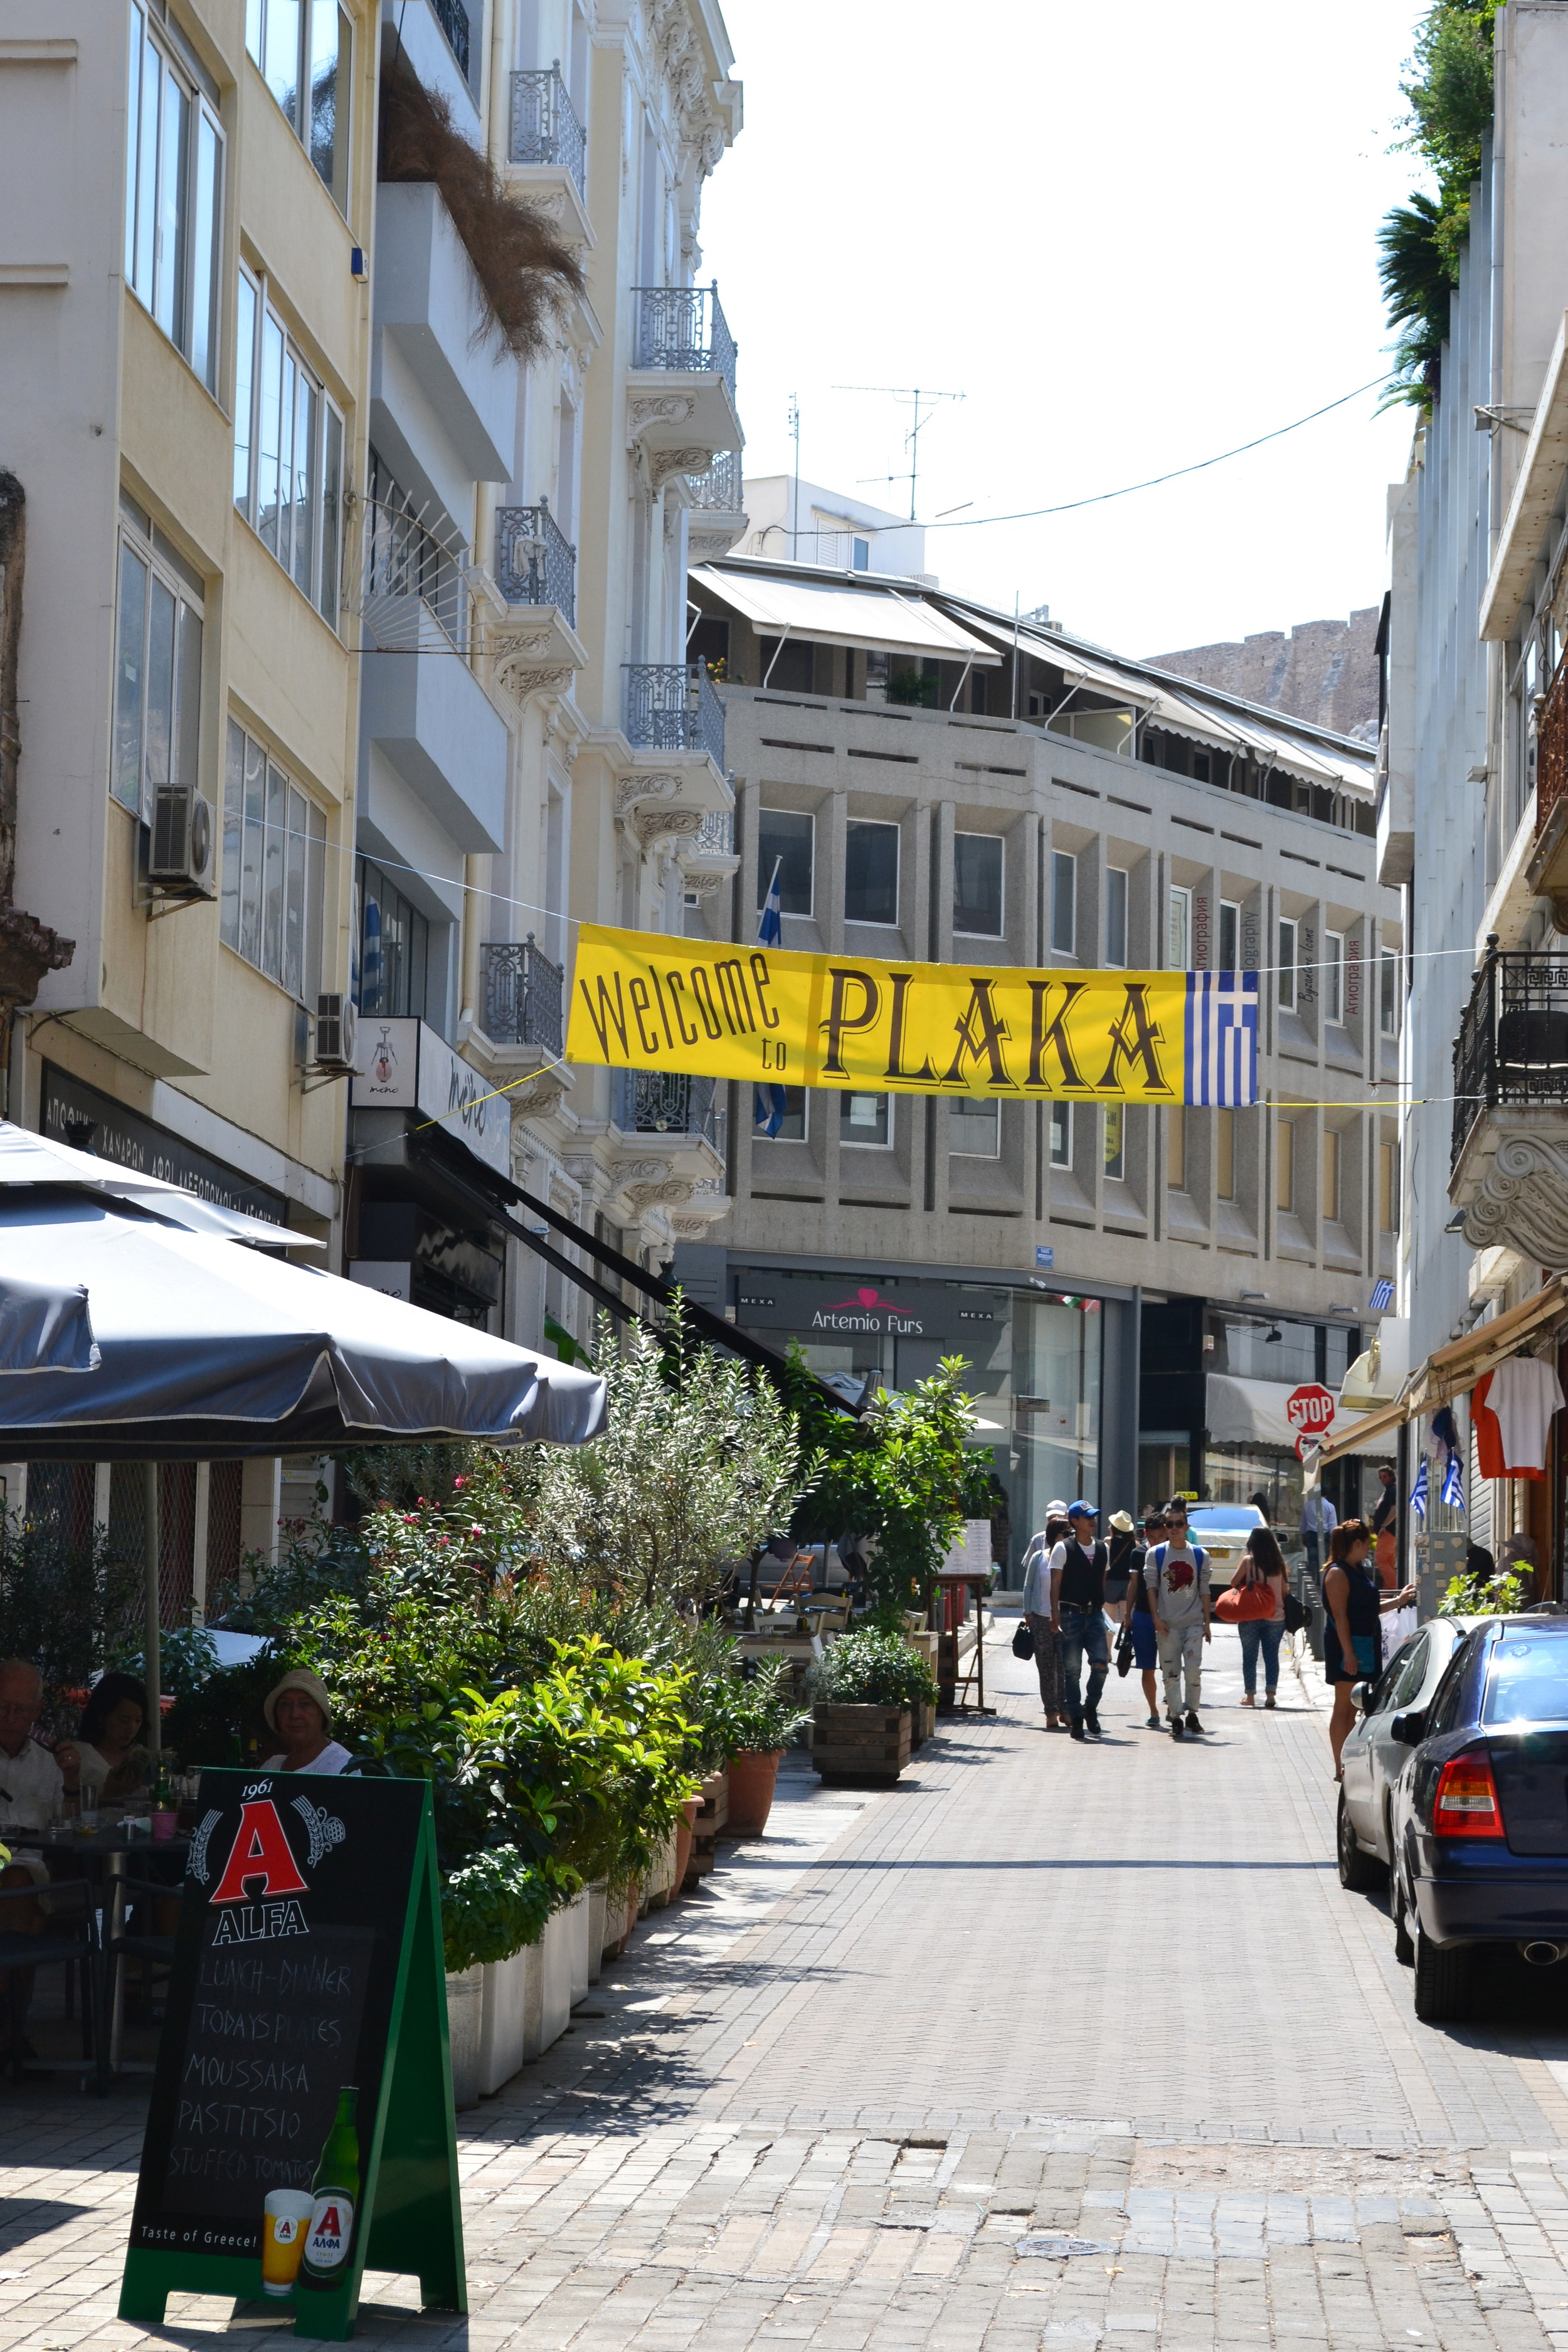 Plaka District